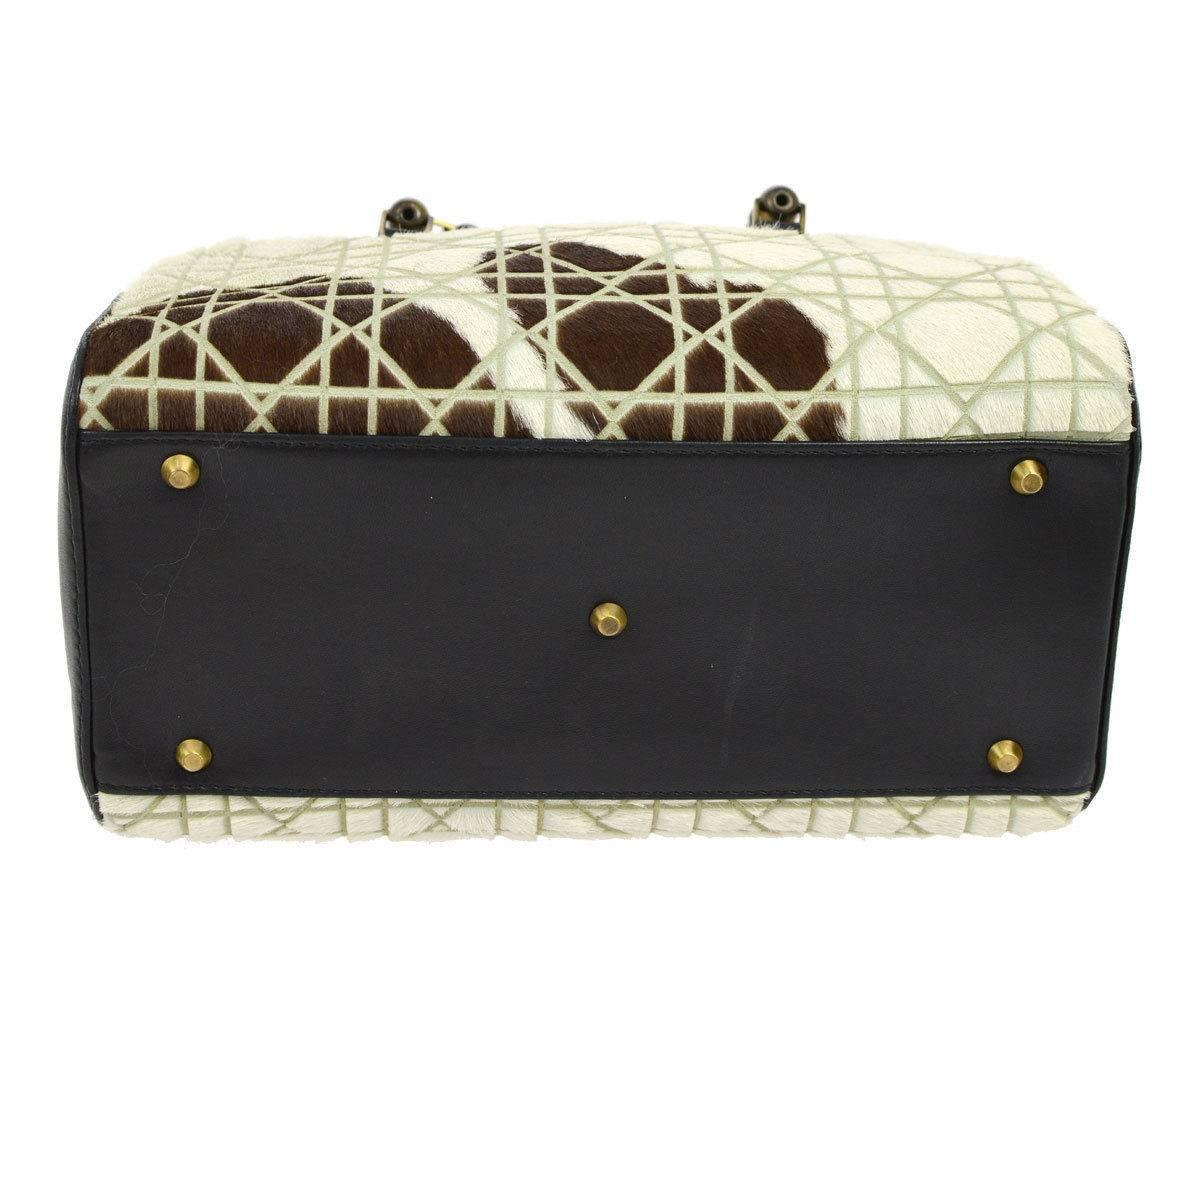 Dior Black Cream Brown Ponyhair Leather Top Handle Satchel Boston Bag qLdND7a